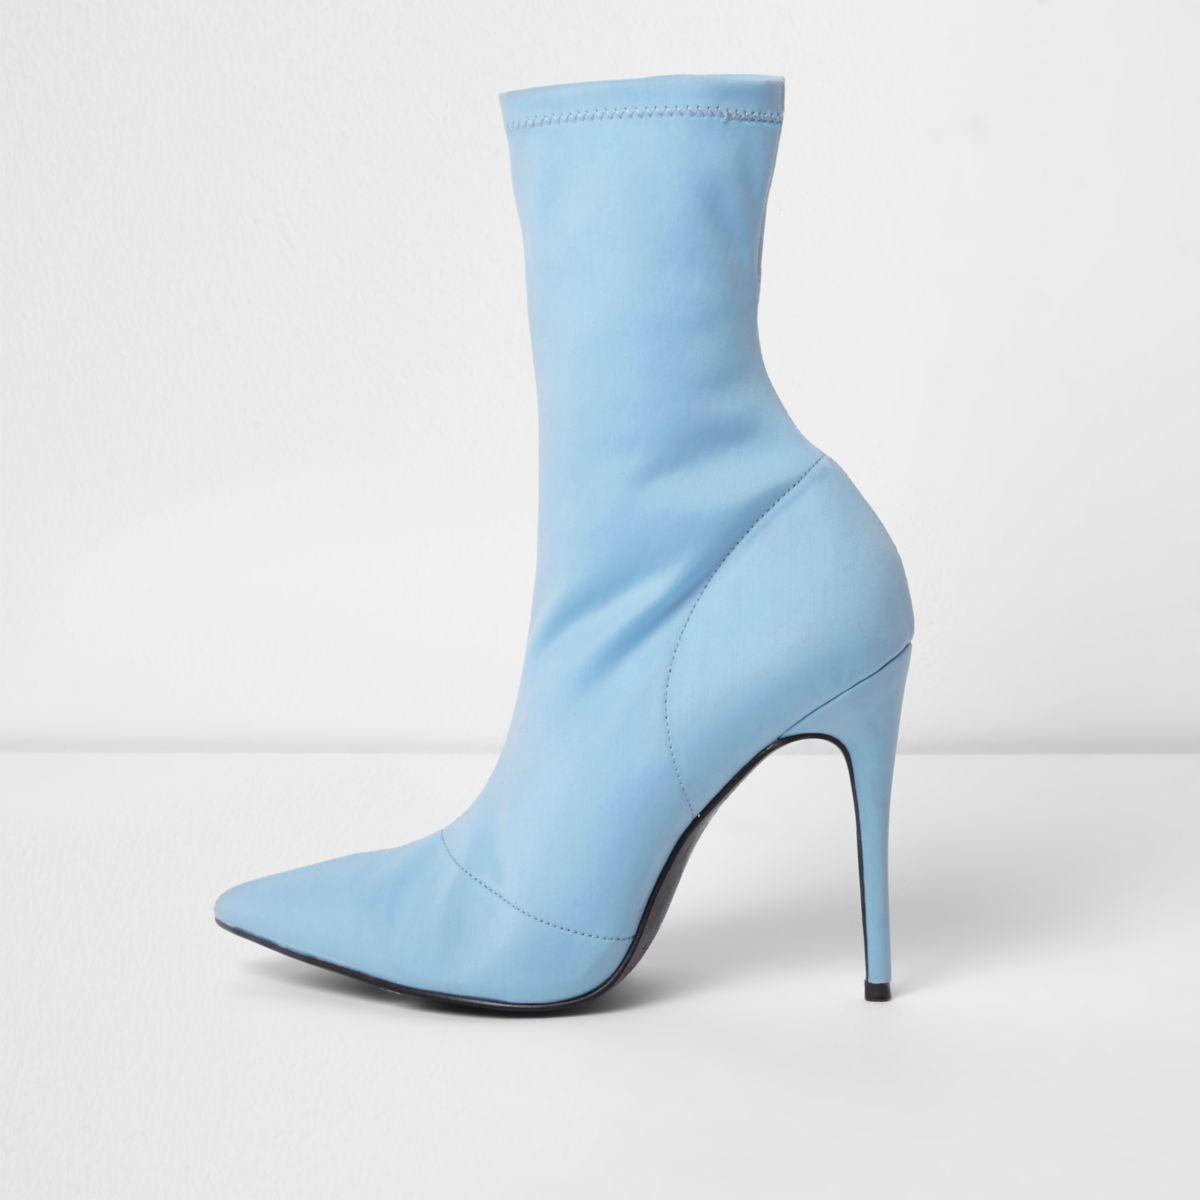 women | Shoes heels stilettos